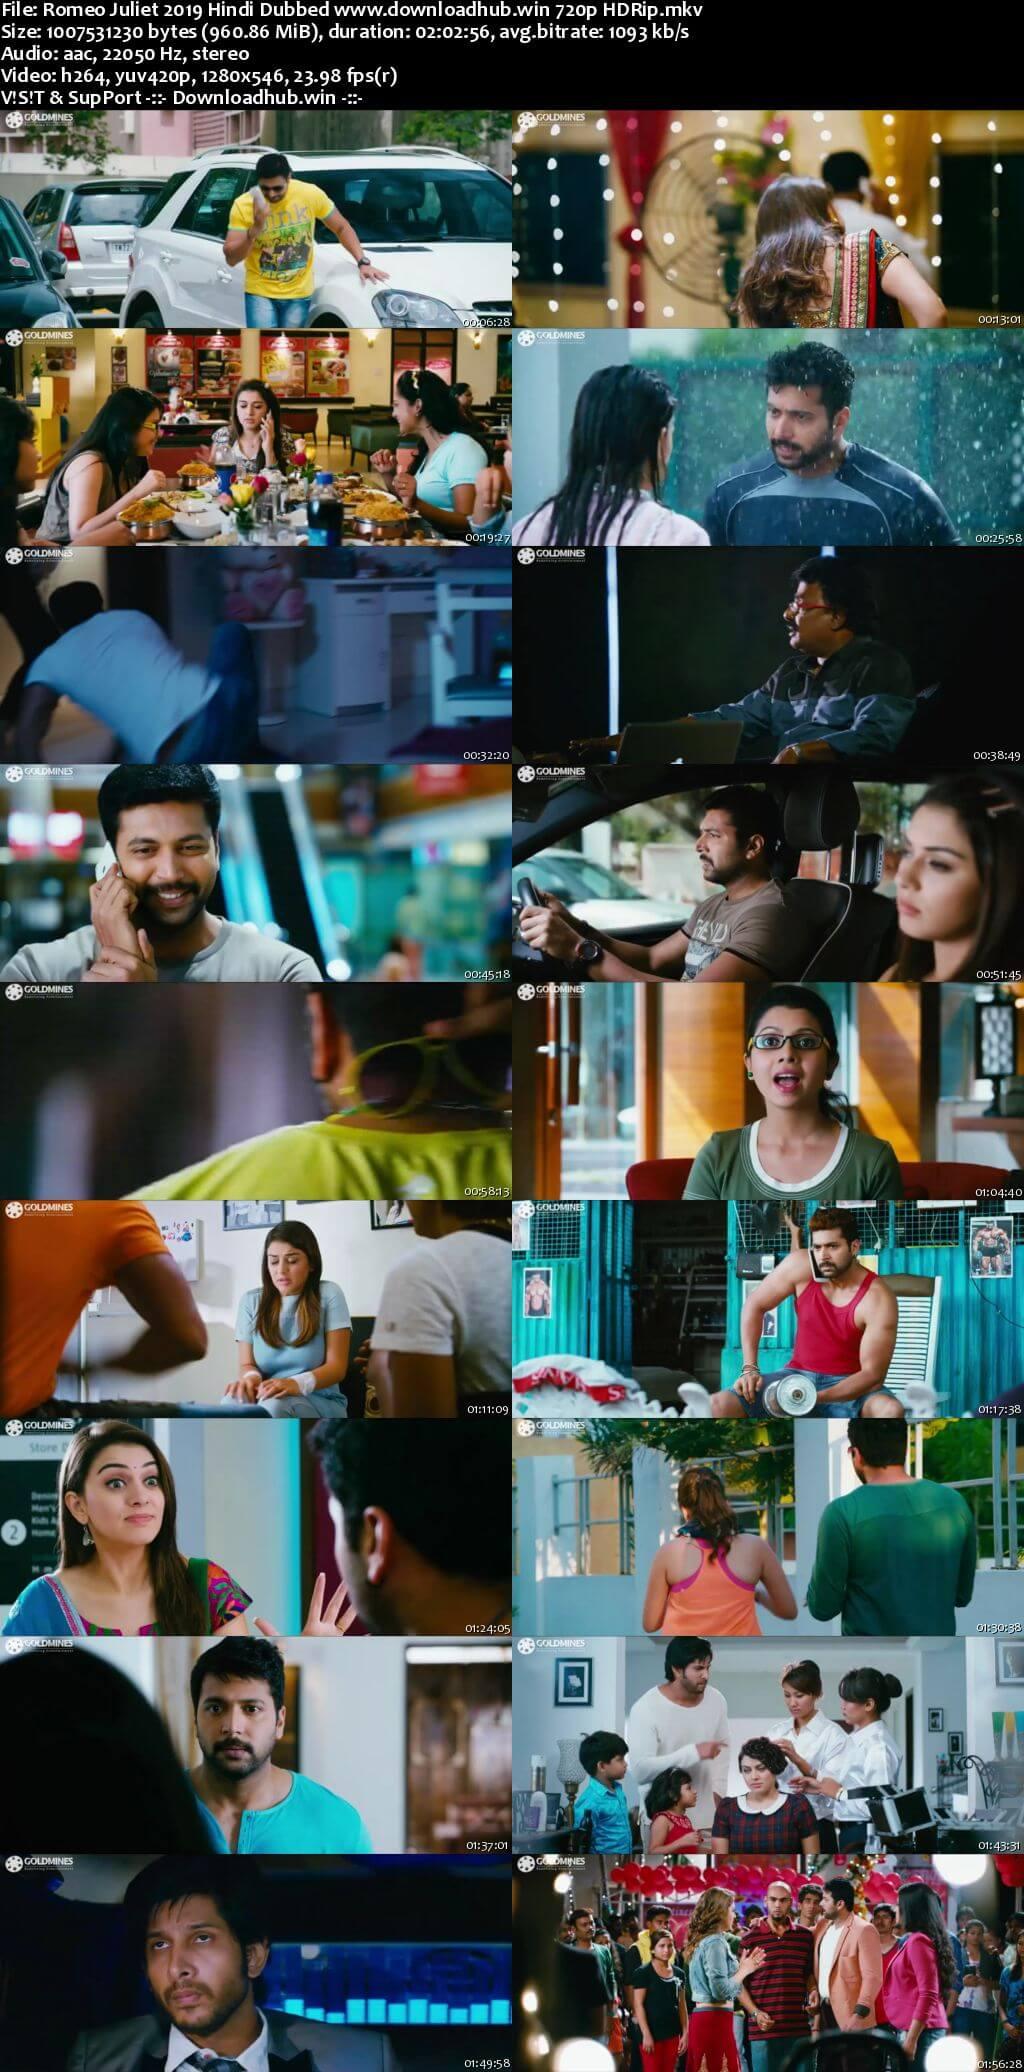 Romeo Juliet 2019 Hindi Dubbed 720p HDRip x264